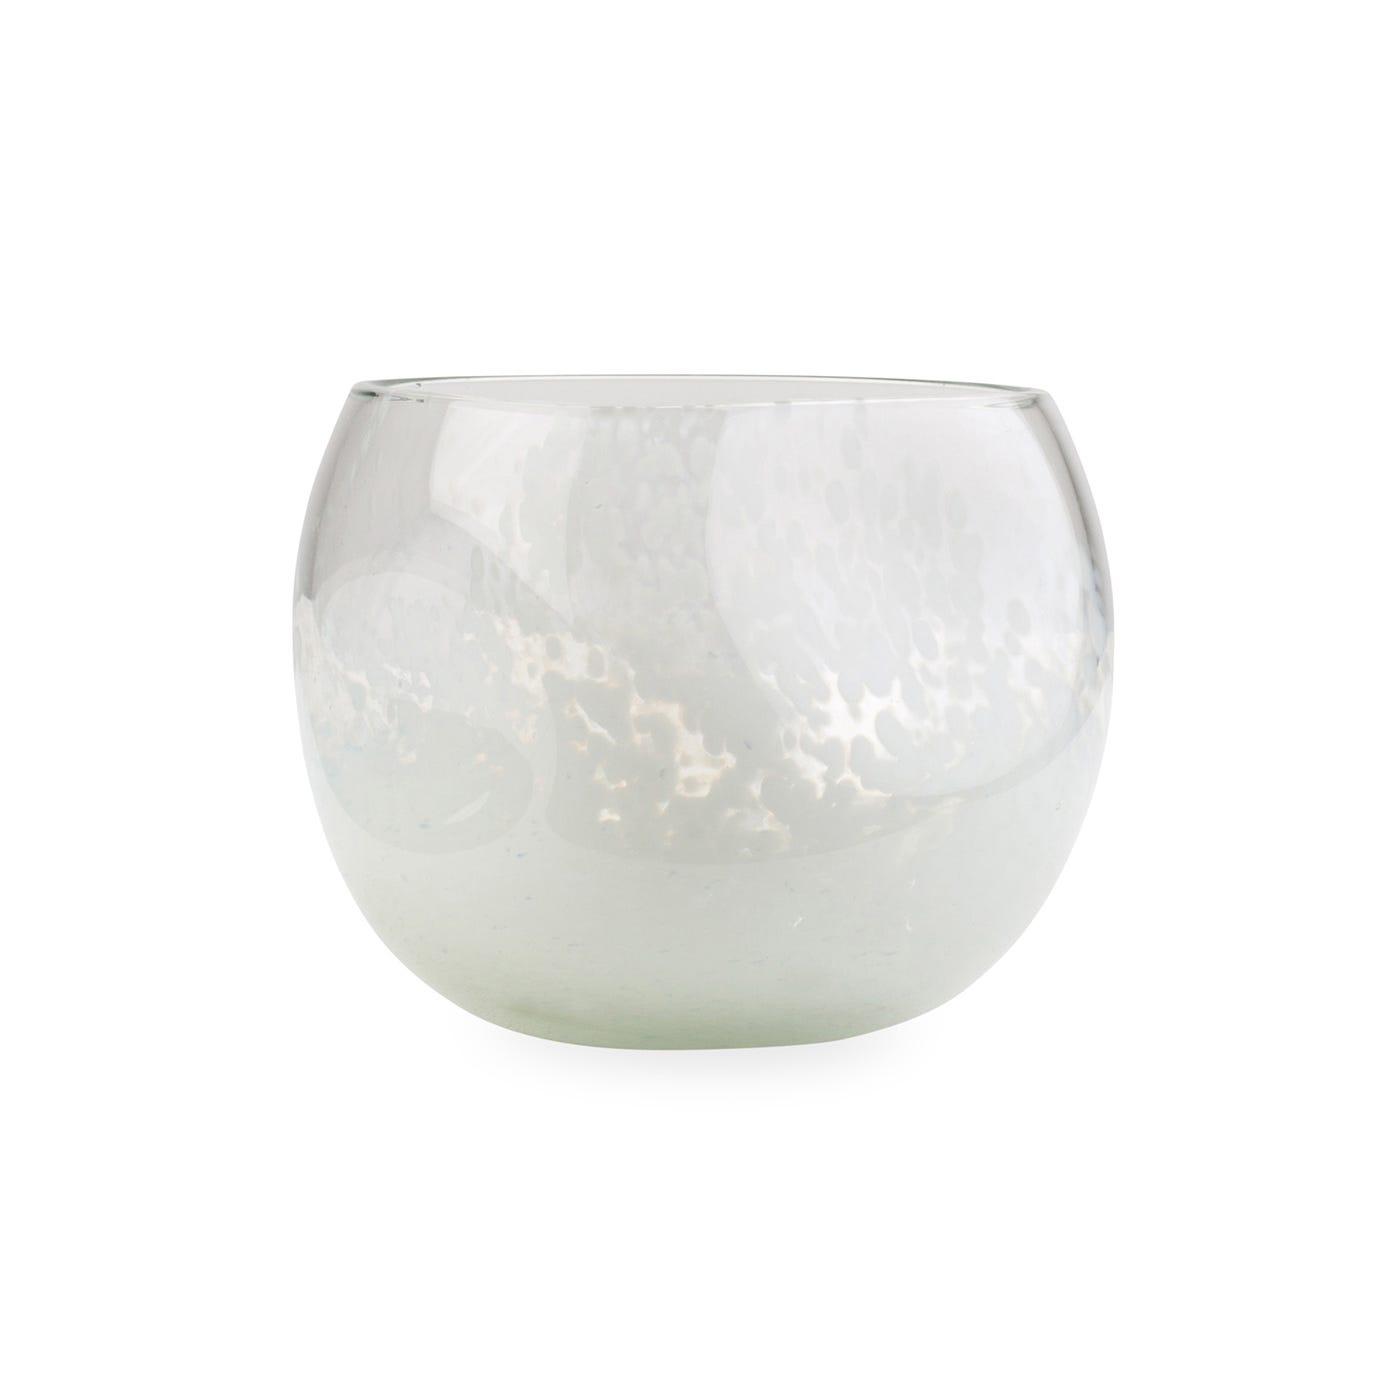 Ngwenya Glass TM Organic Tumbler White Marble